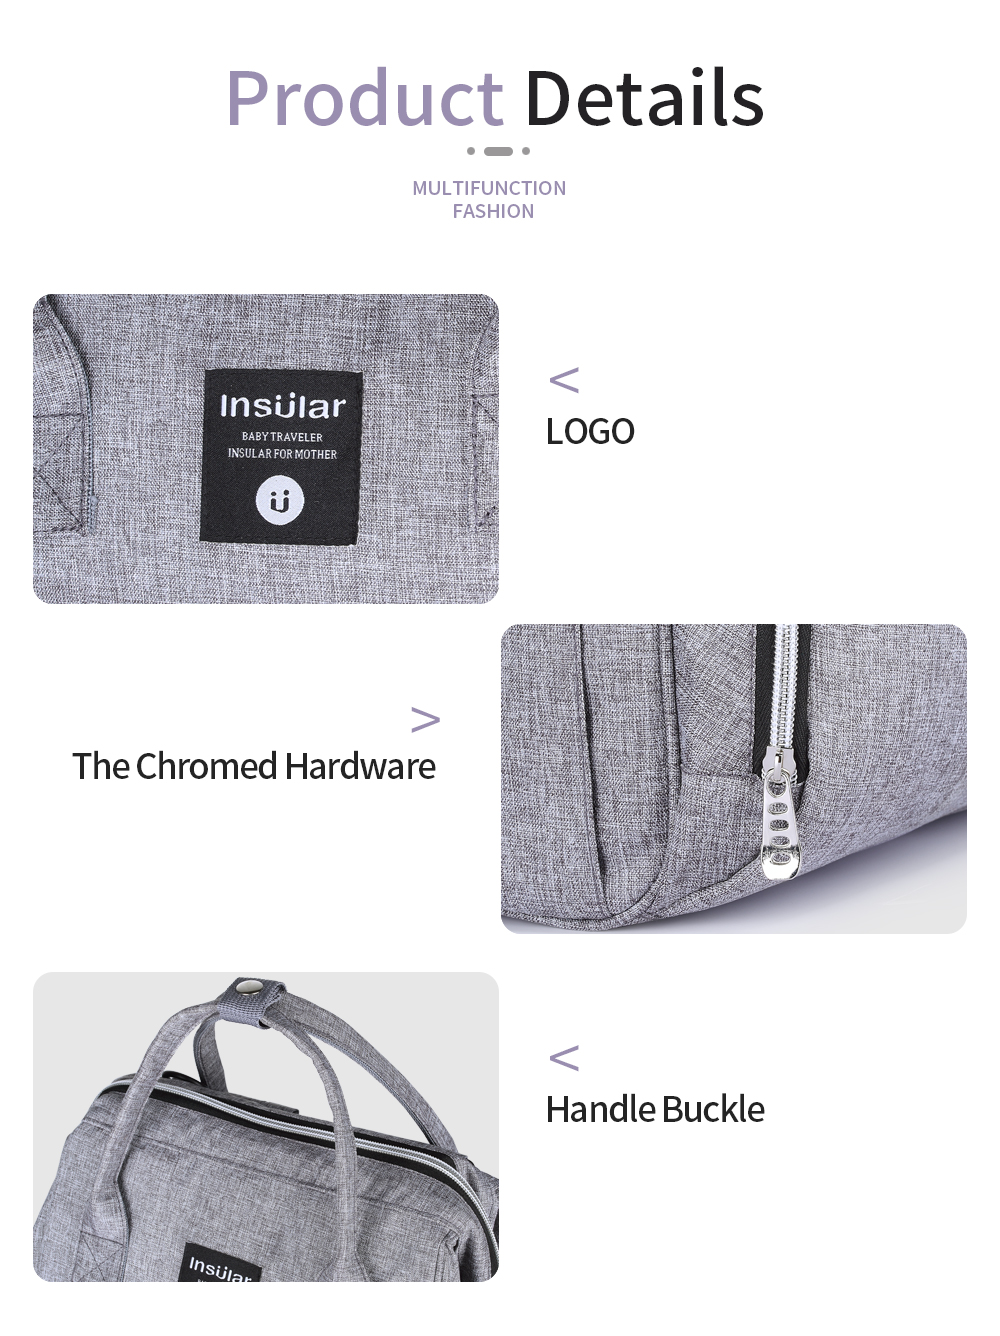 insular diaper bag (12)